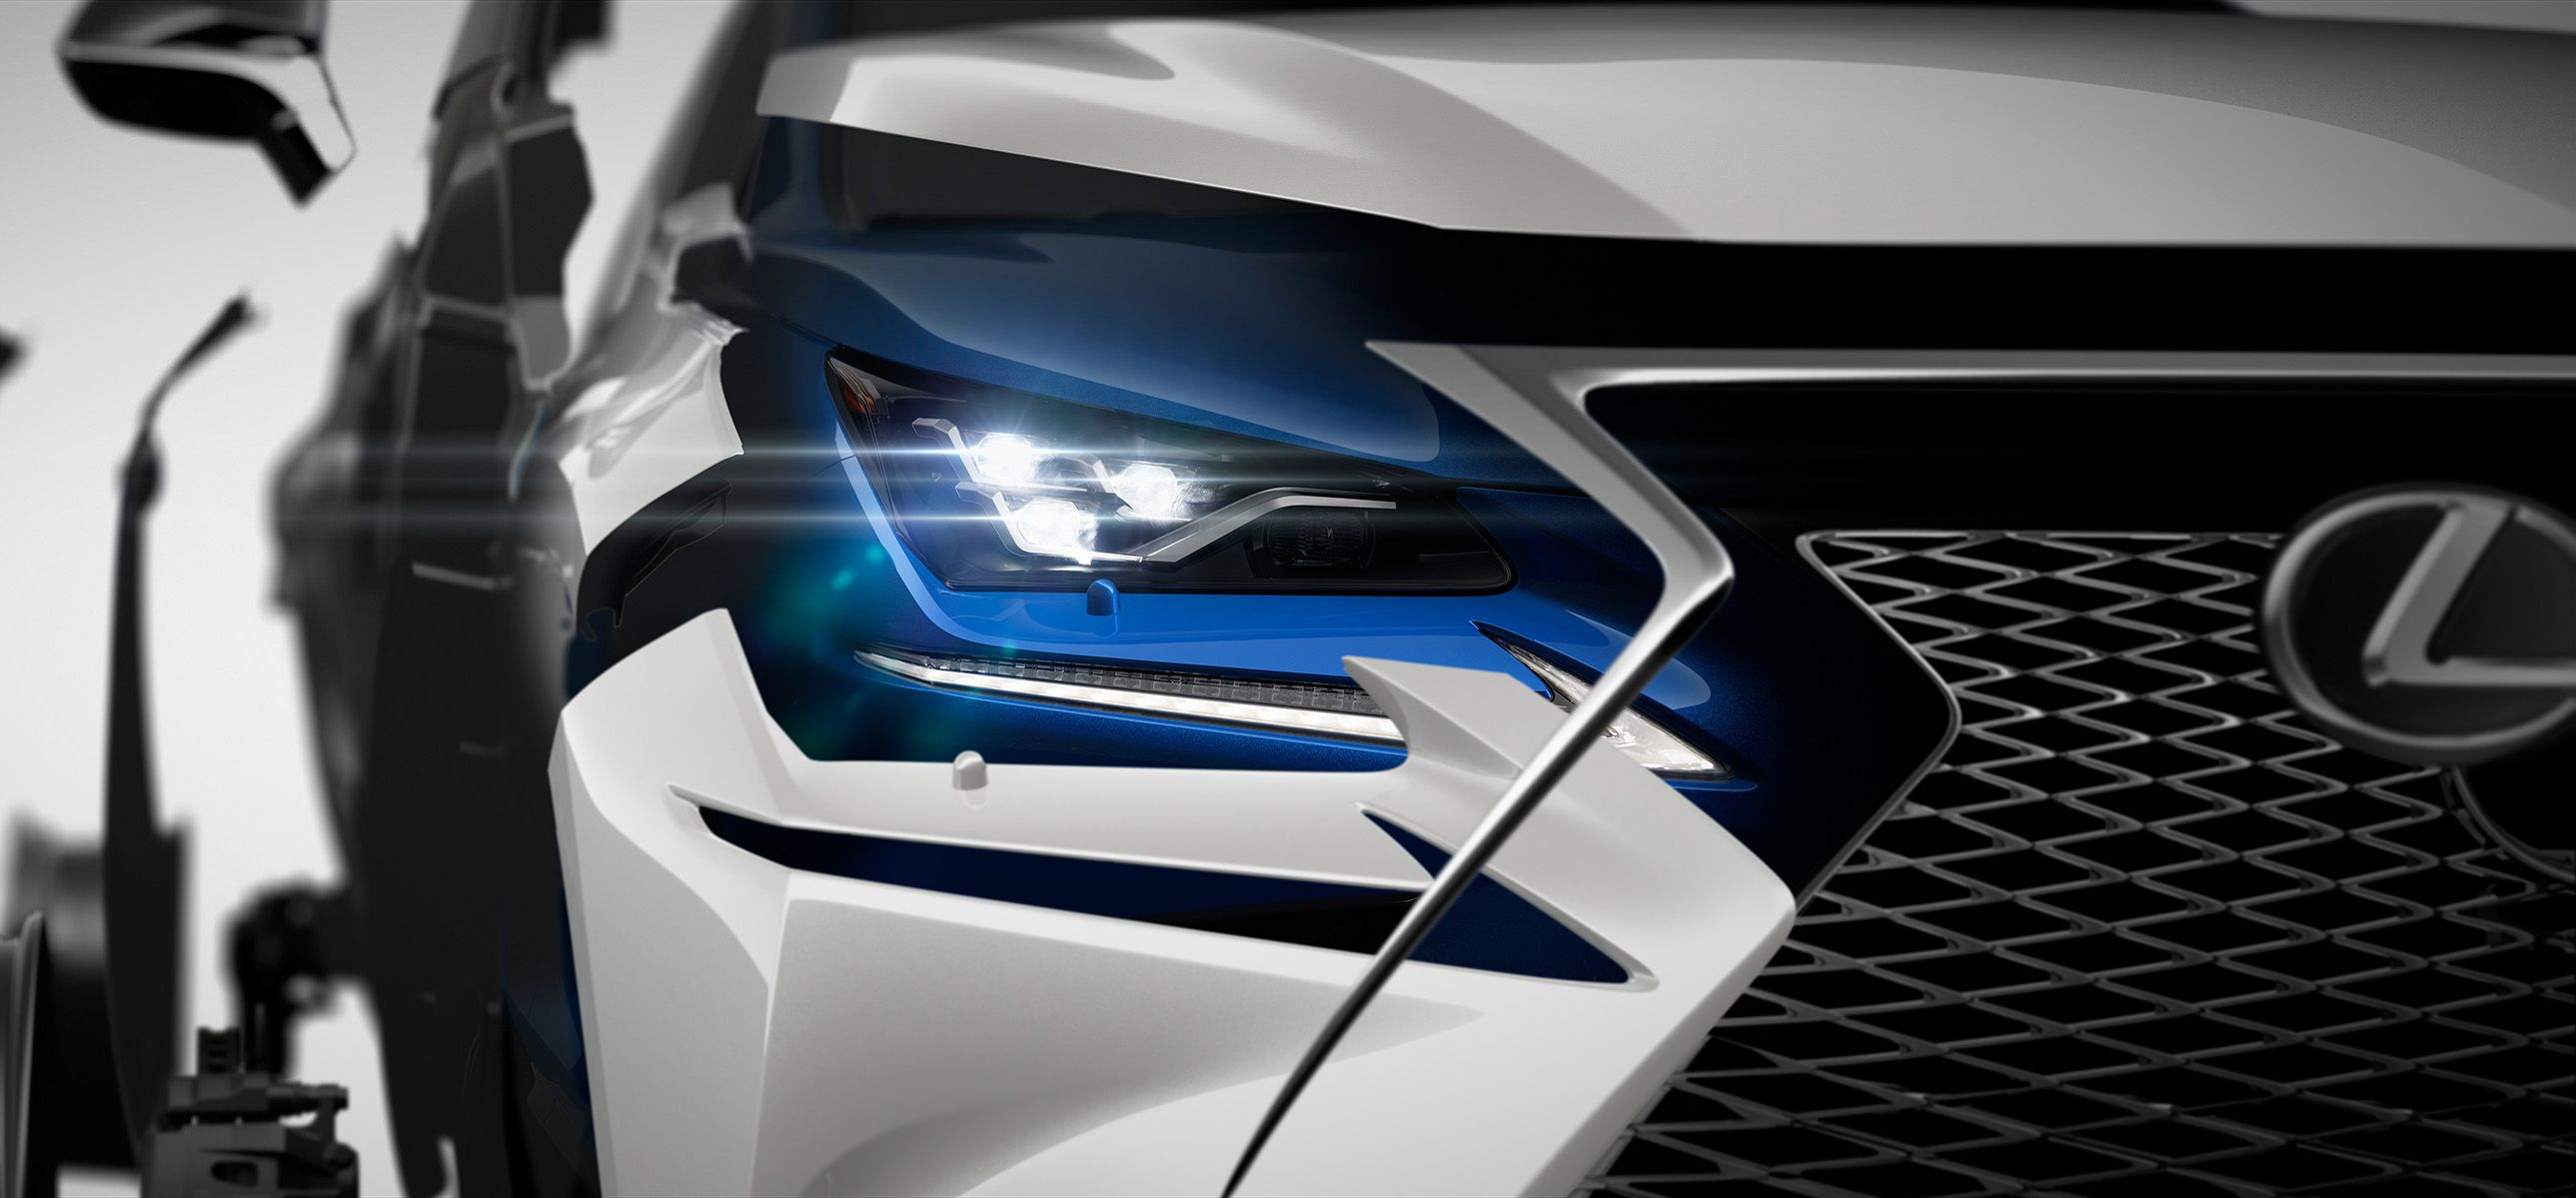 Lexus NX 即将发布,下个月上海国际车展见! New-Lexus ... Lexus